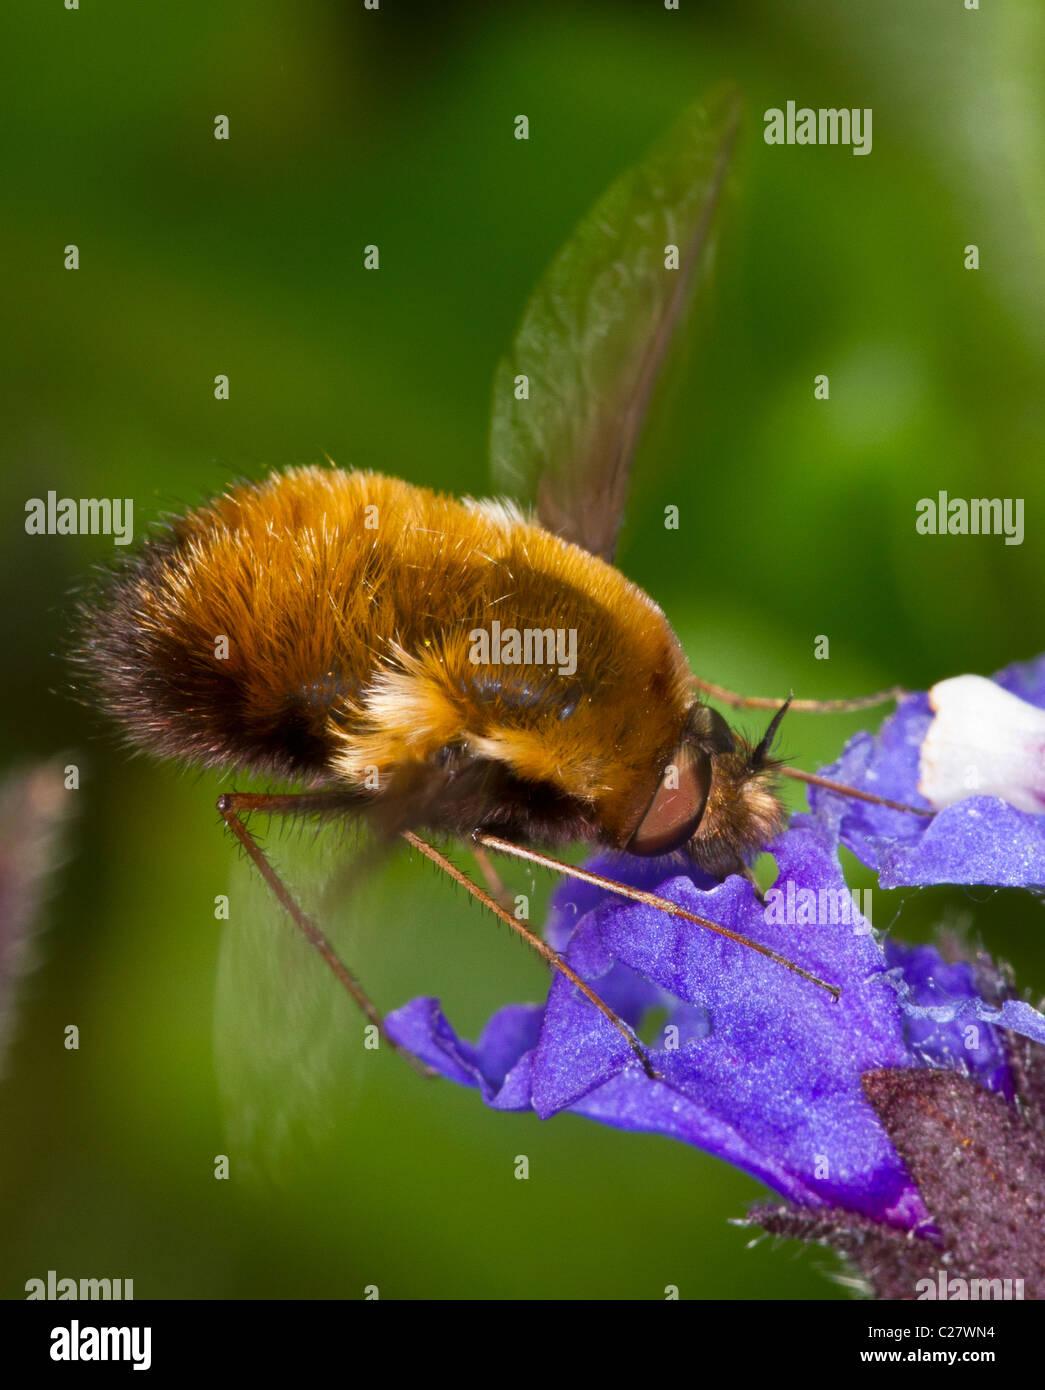 Bombyliidae family: bee-fly, probably Bombylius major, hovering and feeding on nectar of pulmonaria - Stock Image